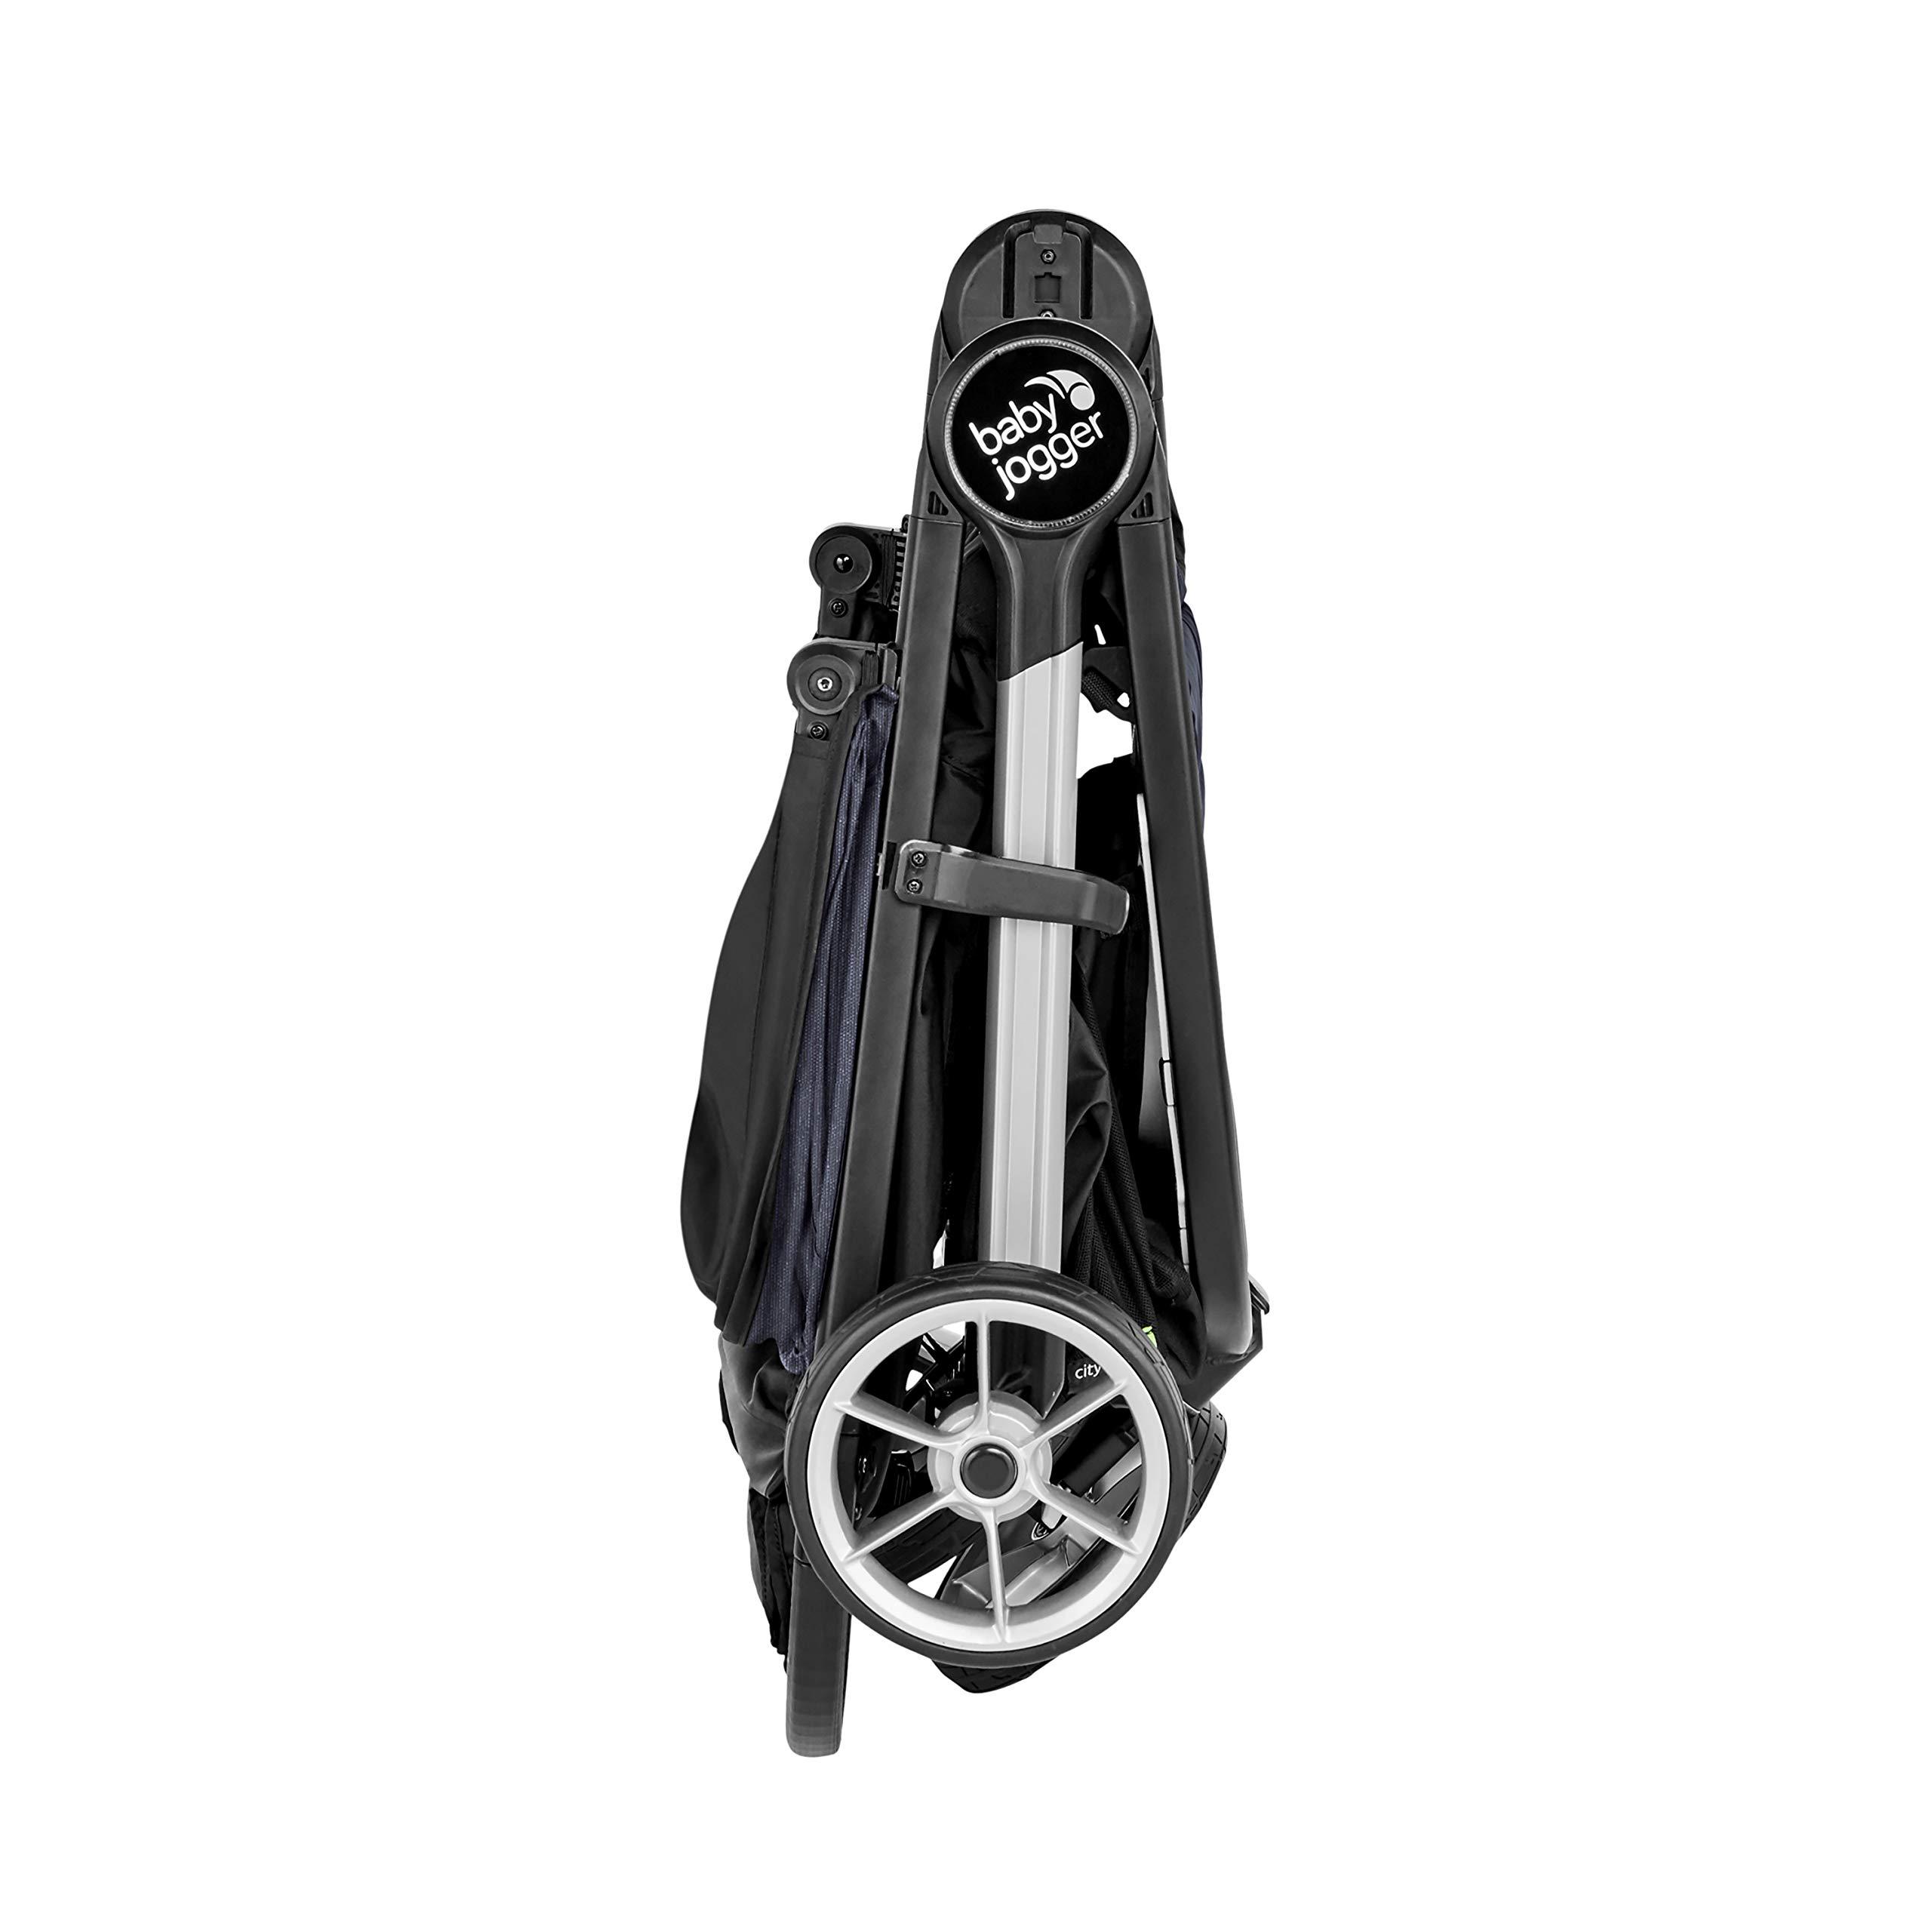 Baby Jogger City Mini 2 Stroller - 2019   Compact, Lightweight Stroller   Quick Fold Baby Stroller, Carbon by Baby Jogger (Image #14)